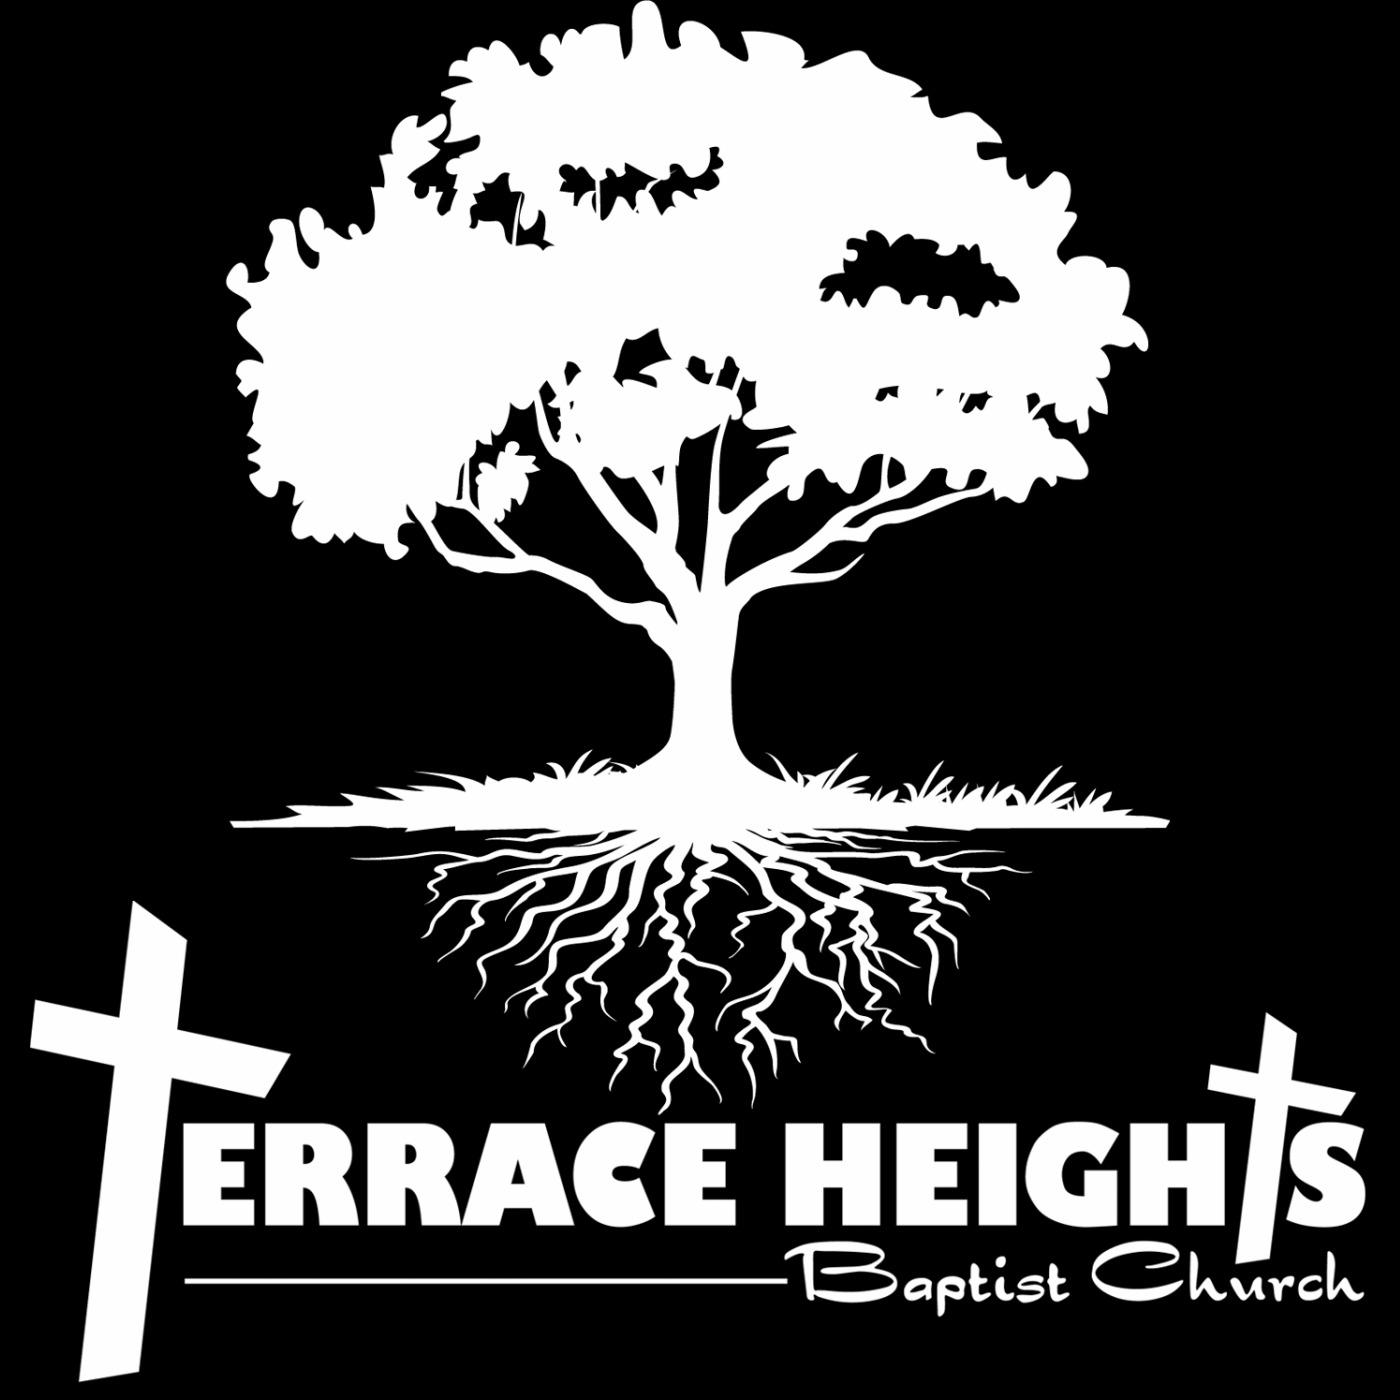 Sermons at Terrace Heights Baptist Church